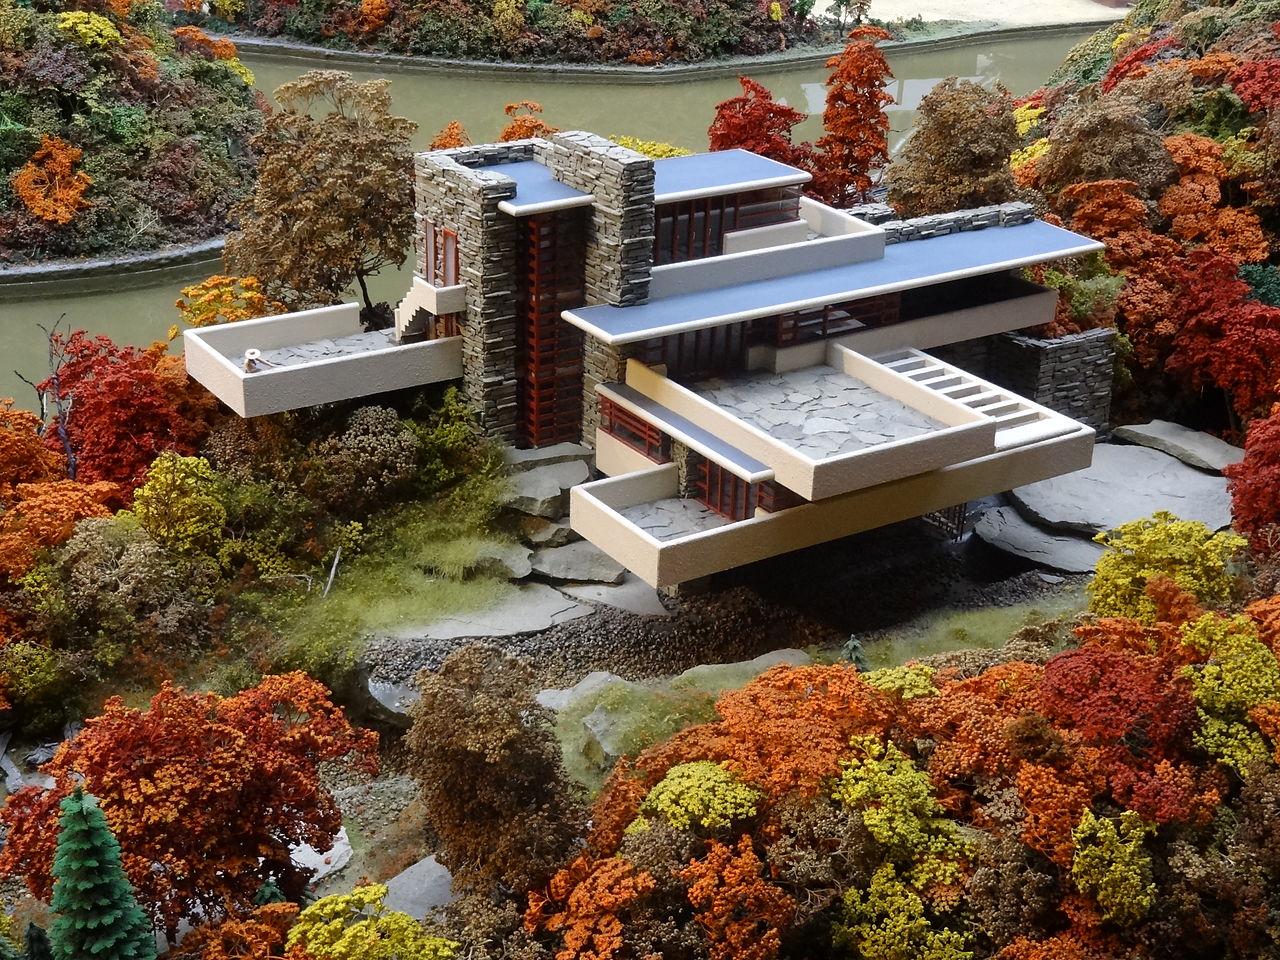 FileFallingwater miniature model at MRRV Carnegie Science CenterJPG  Wikimedia Commons